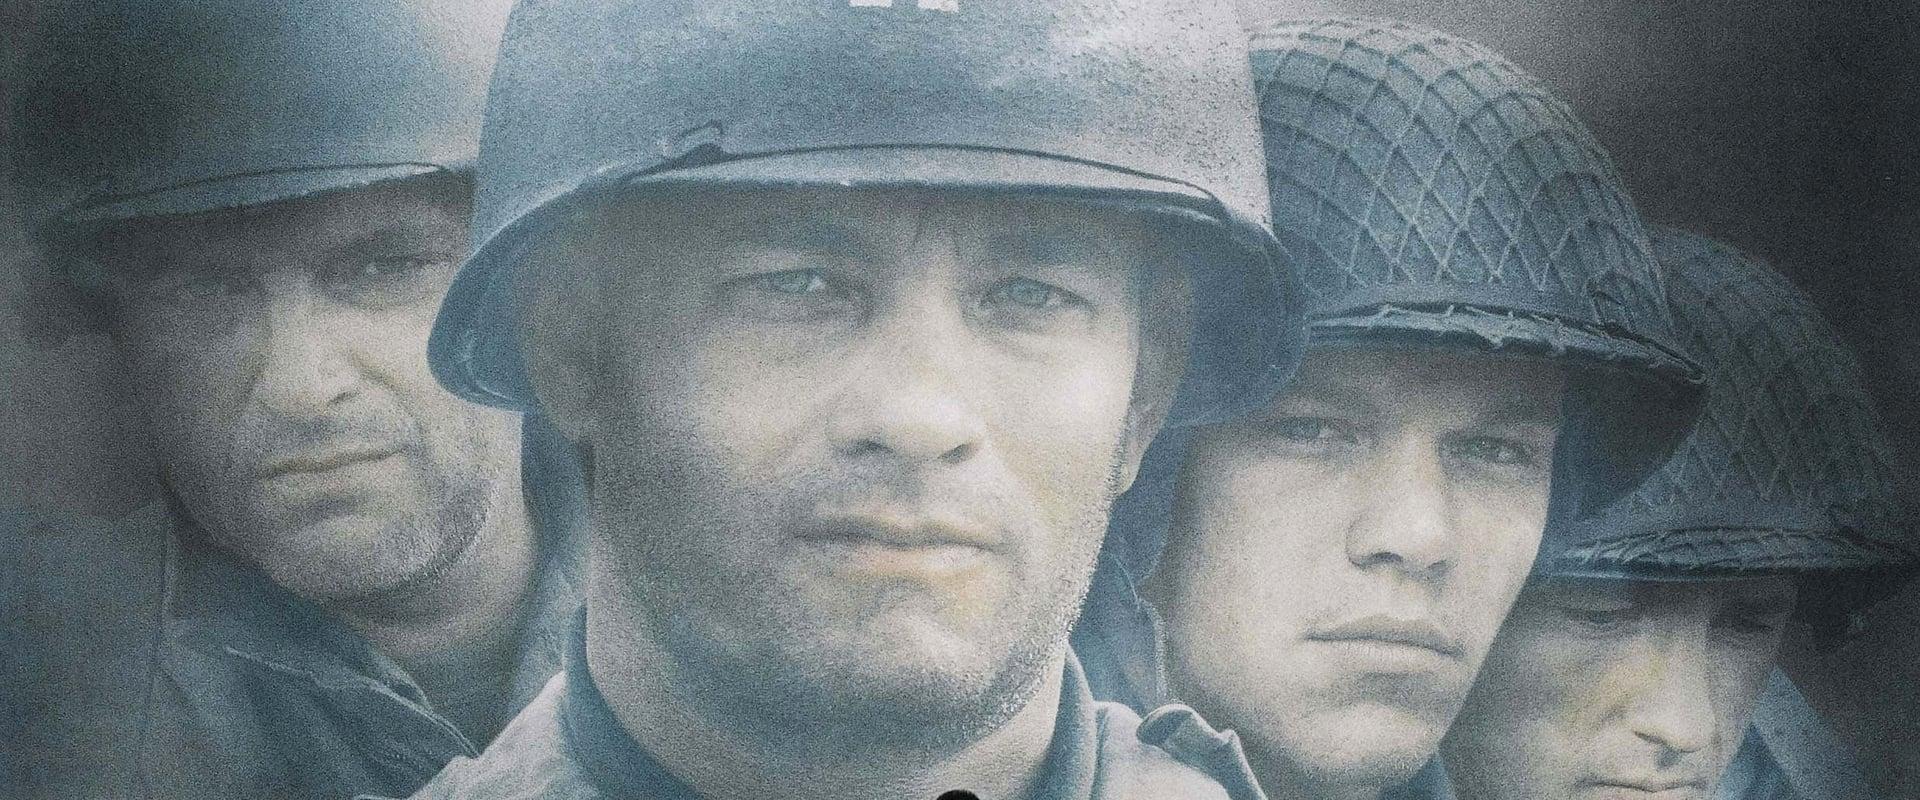 Saving Private Ryan 123Movies Watch Full Movie Online Stream